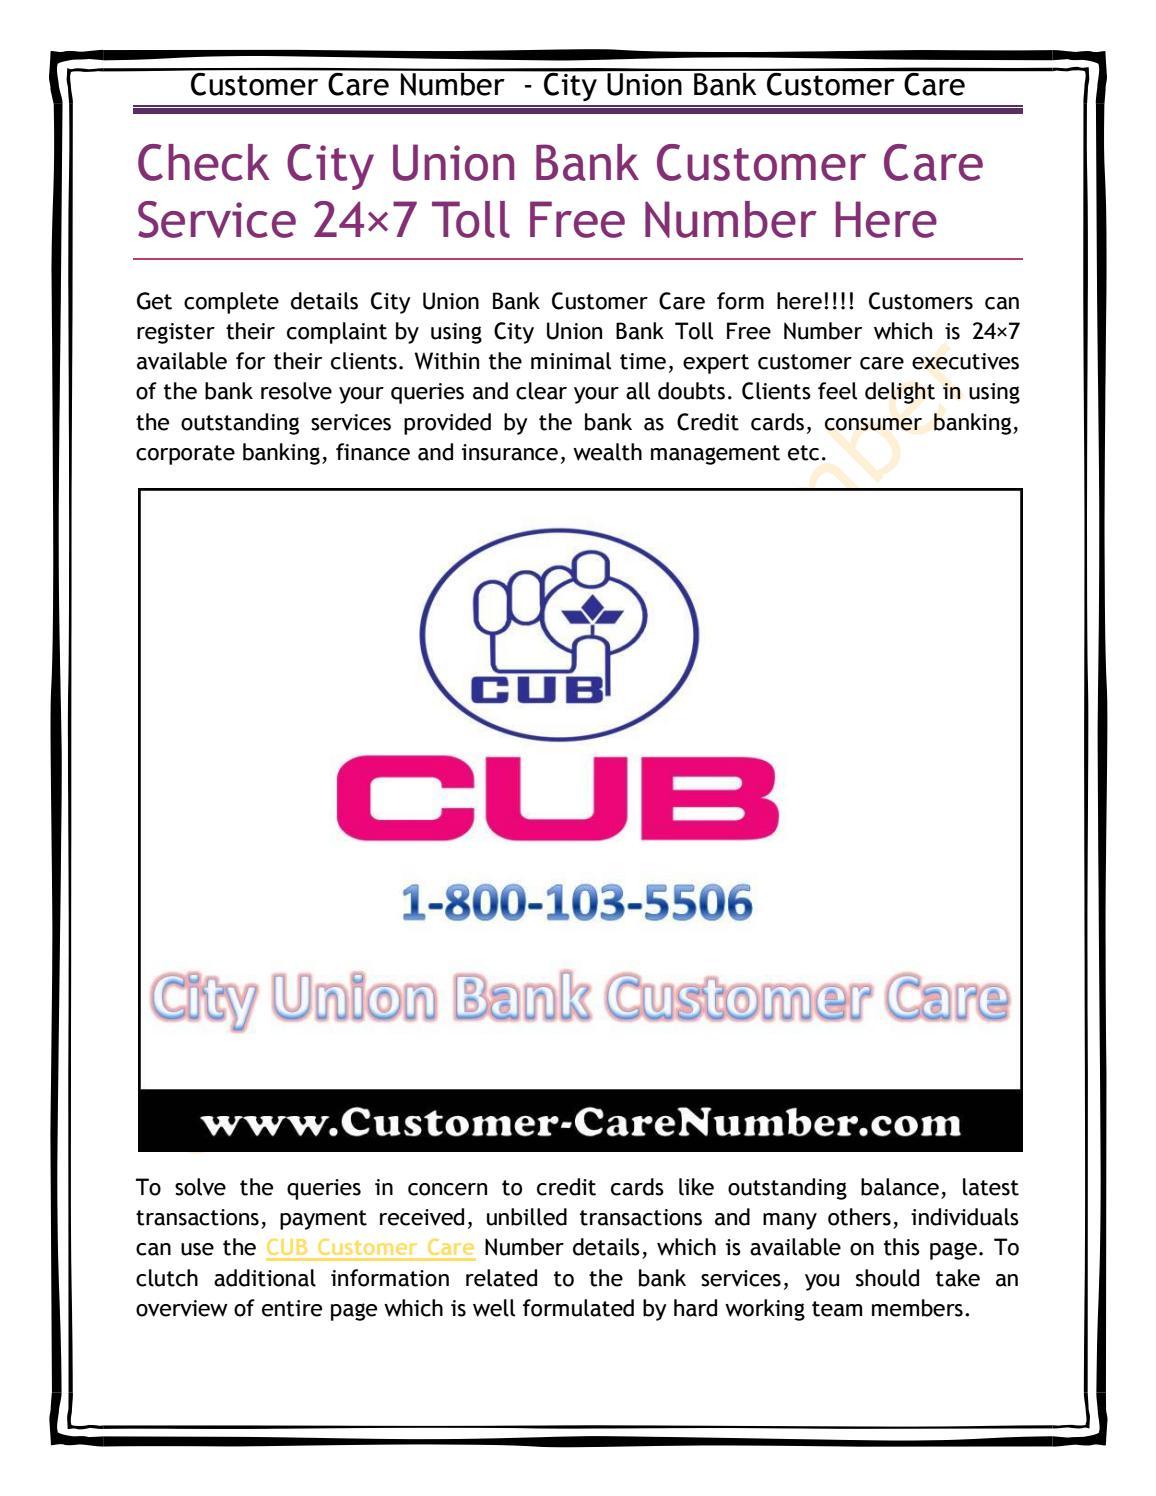 City Union Bank Customer Care by customercarenum - issuu